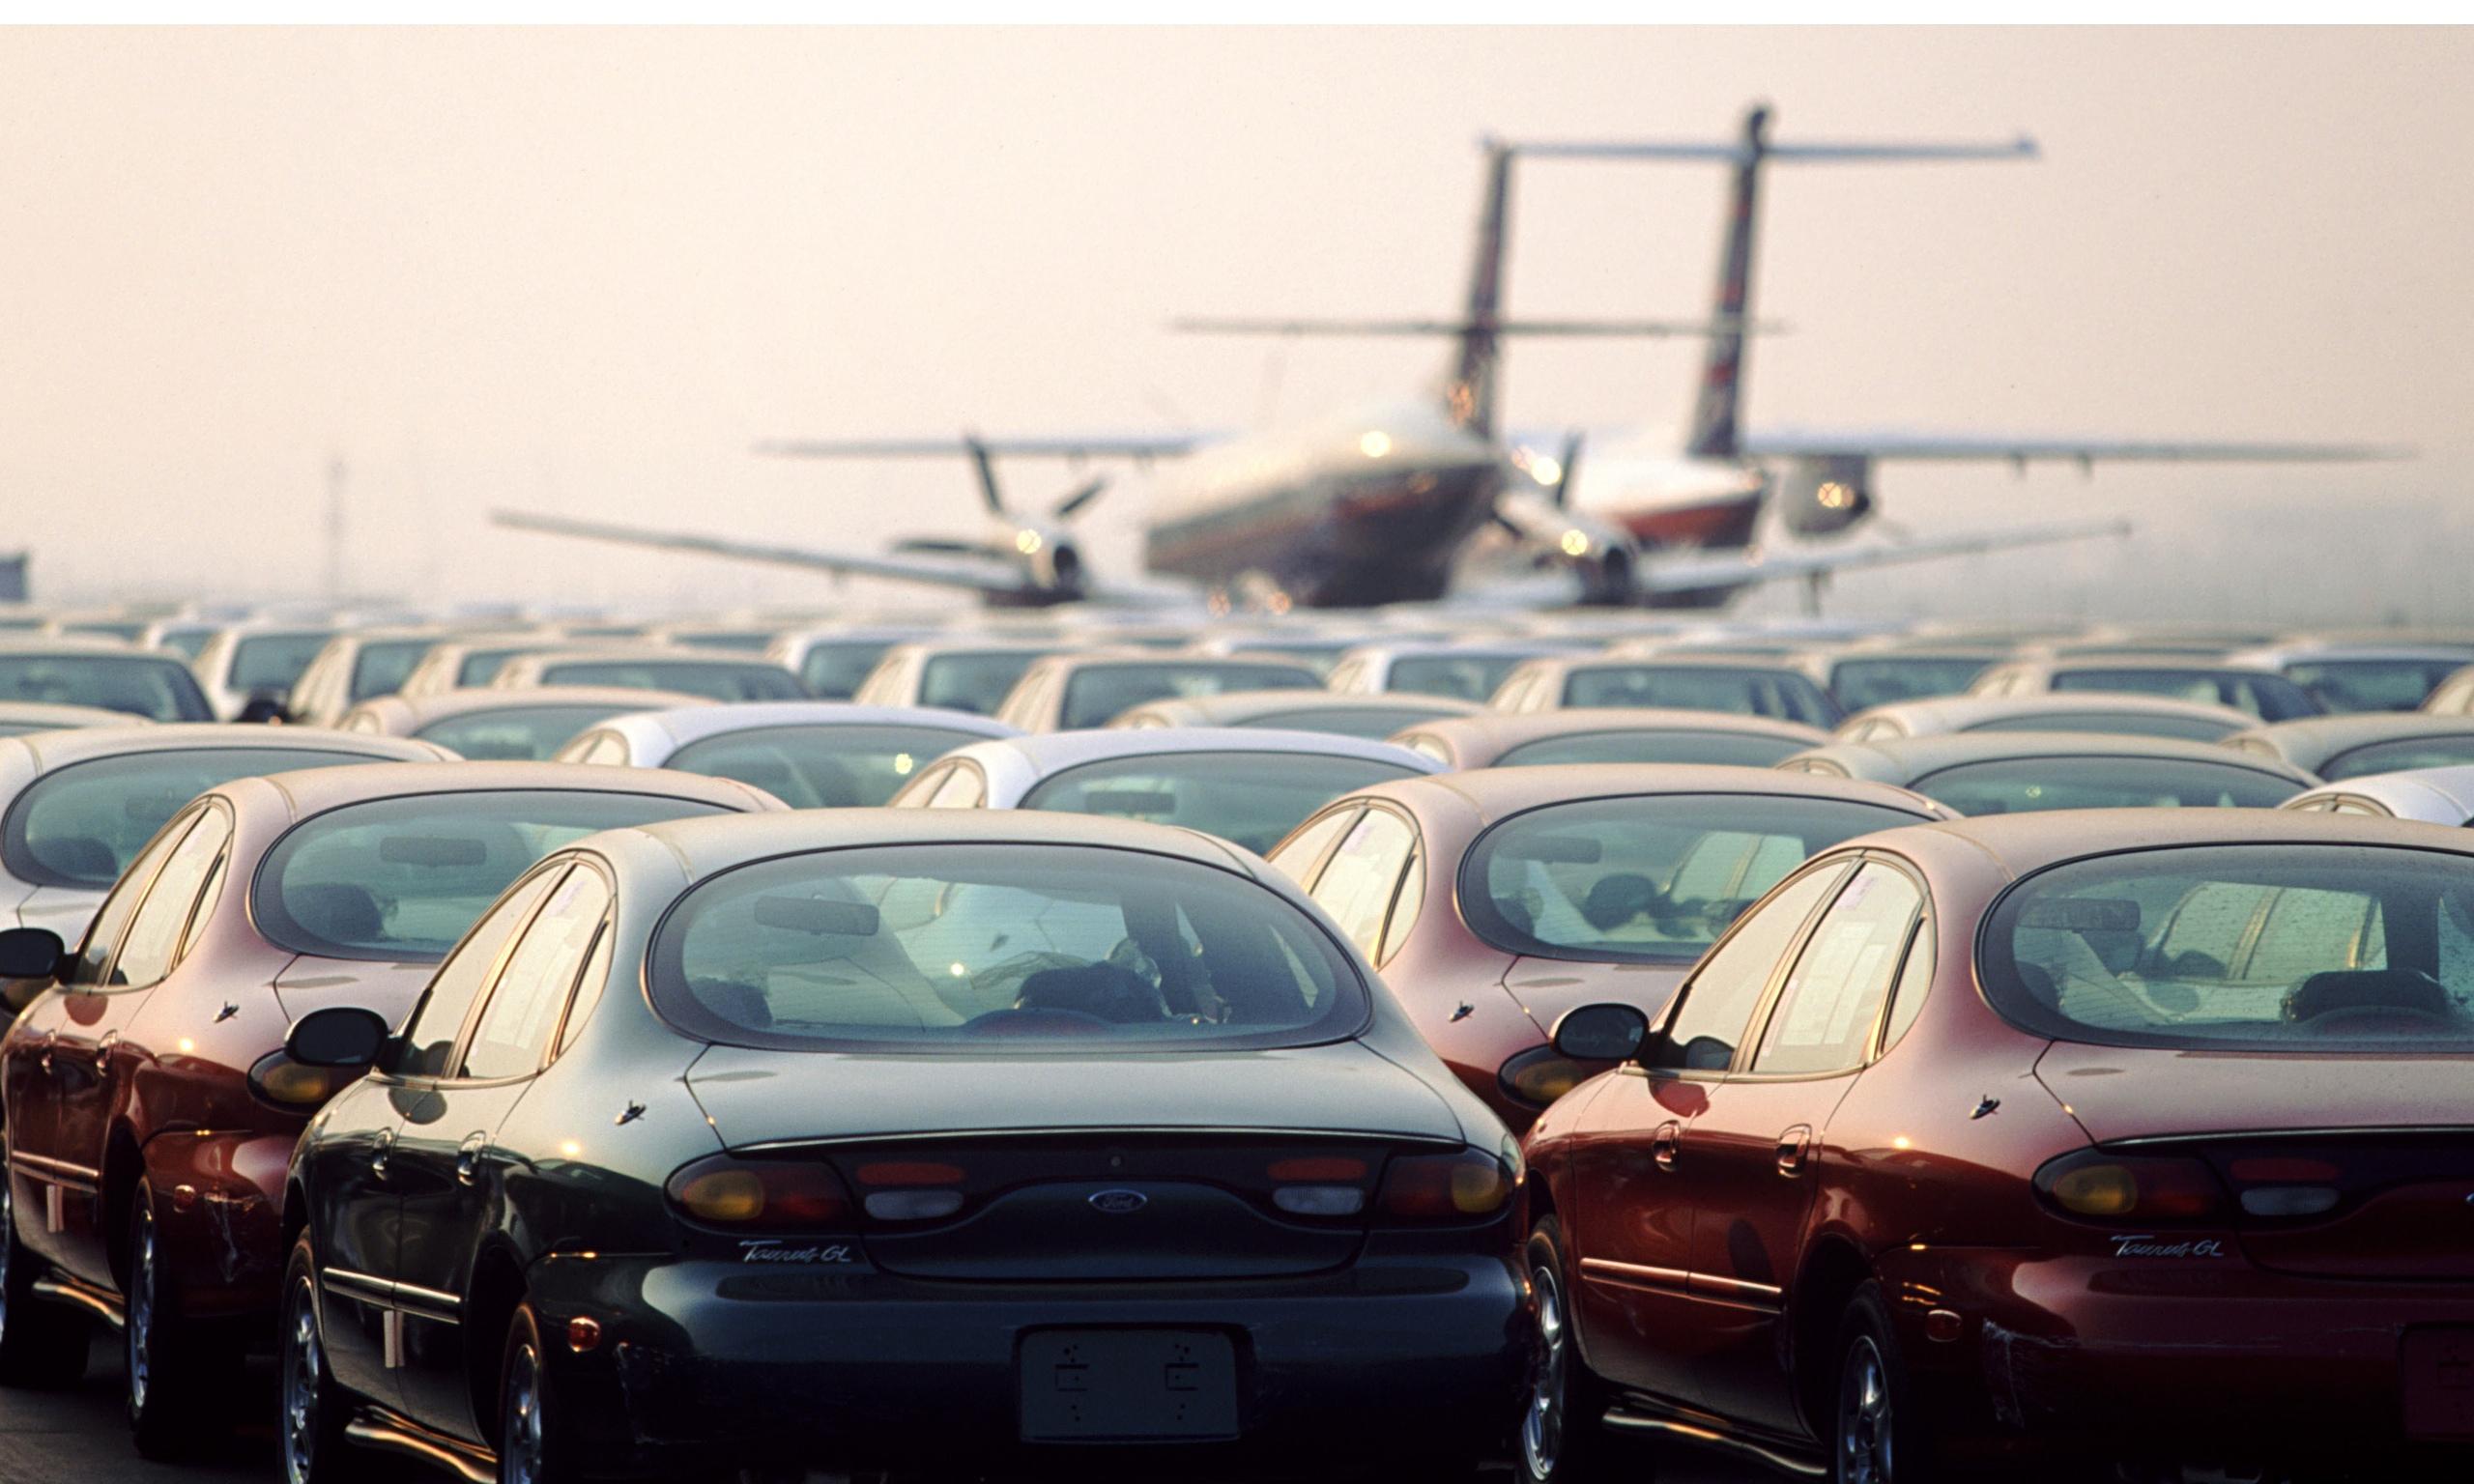 heathrow airport meet and greet car parking